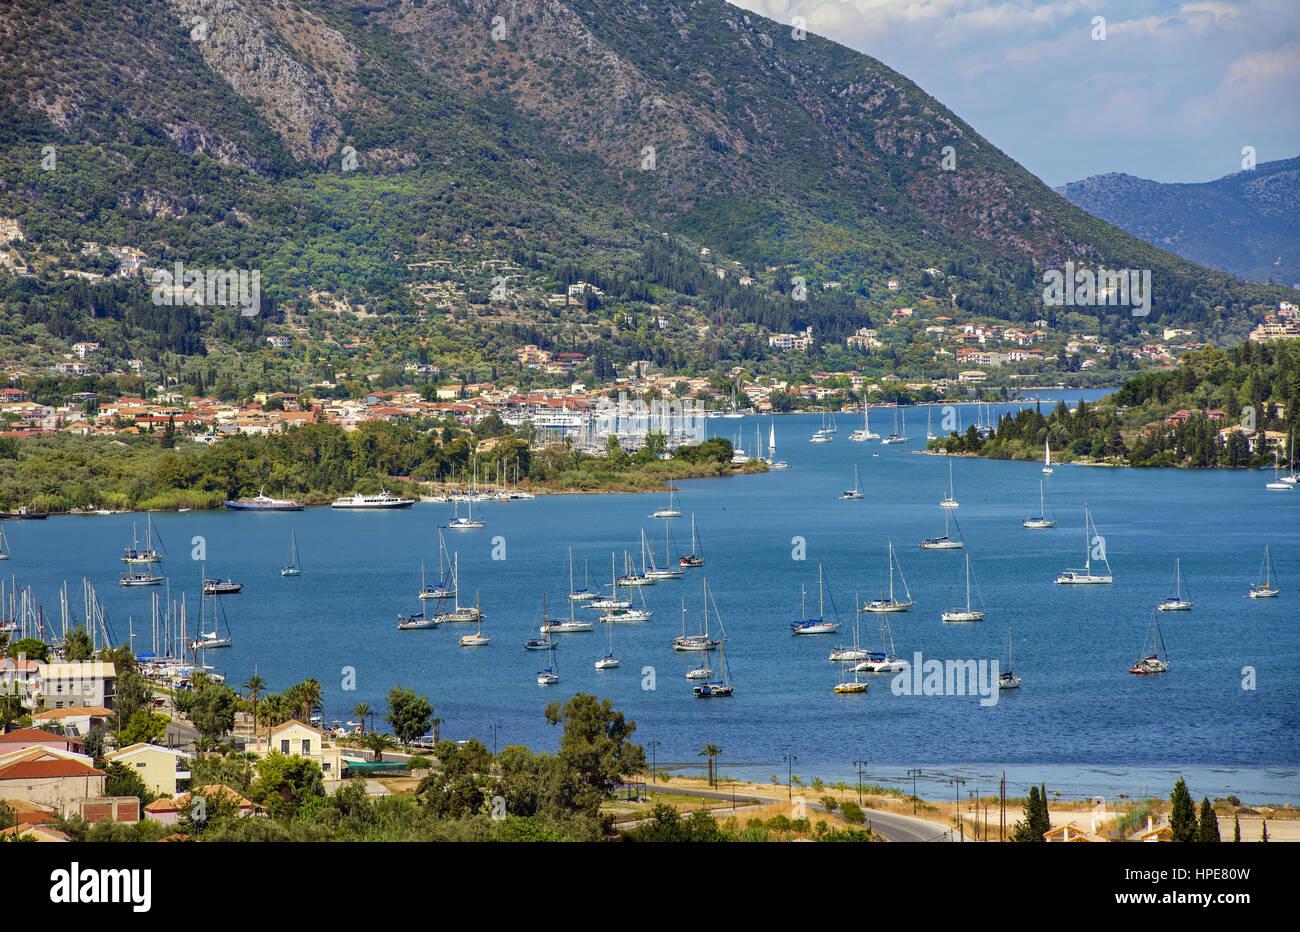 Geni port, near Nydri resort at Lefkada island located in the Ionian Sea, Greece - Stock Image